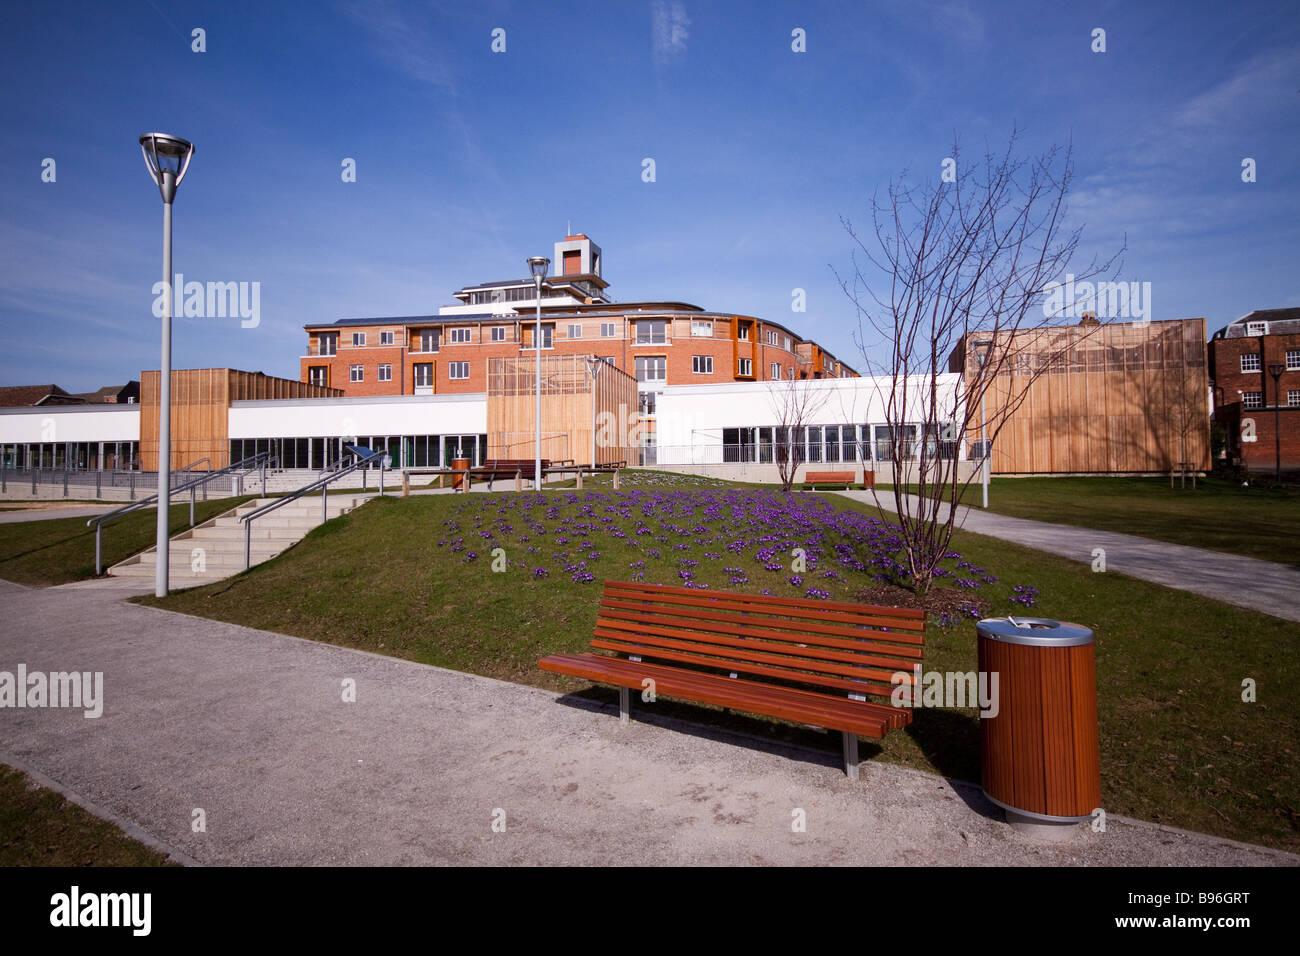 Castle Quay Development - Stock Image